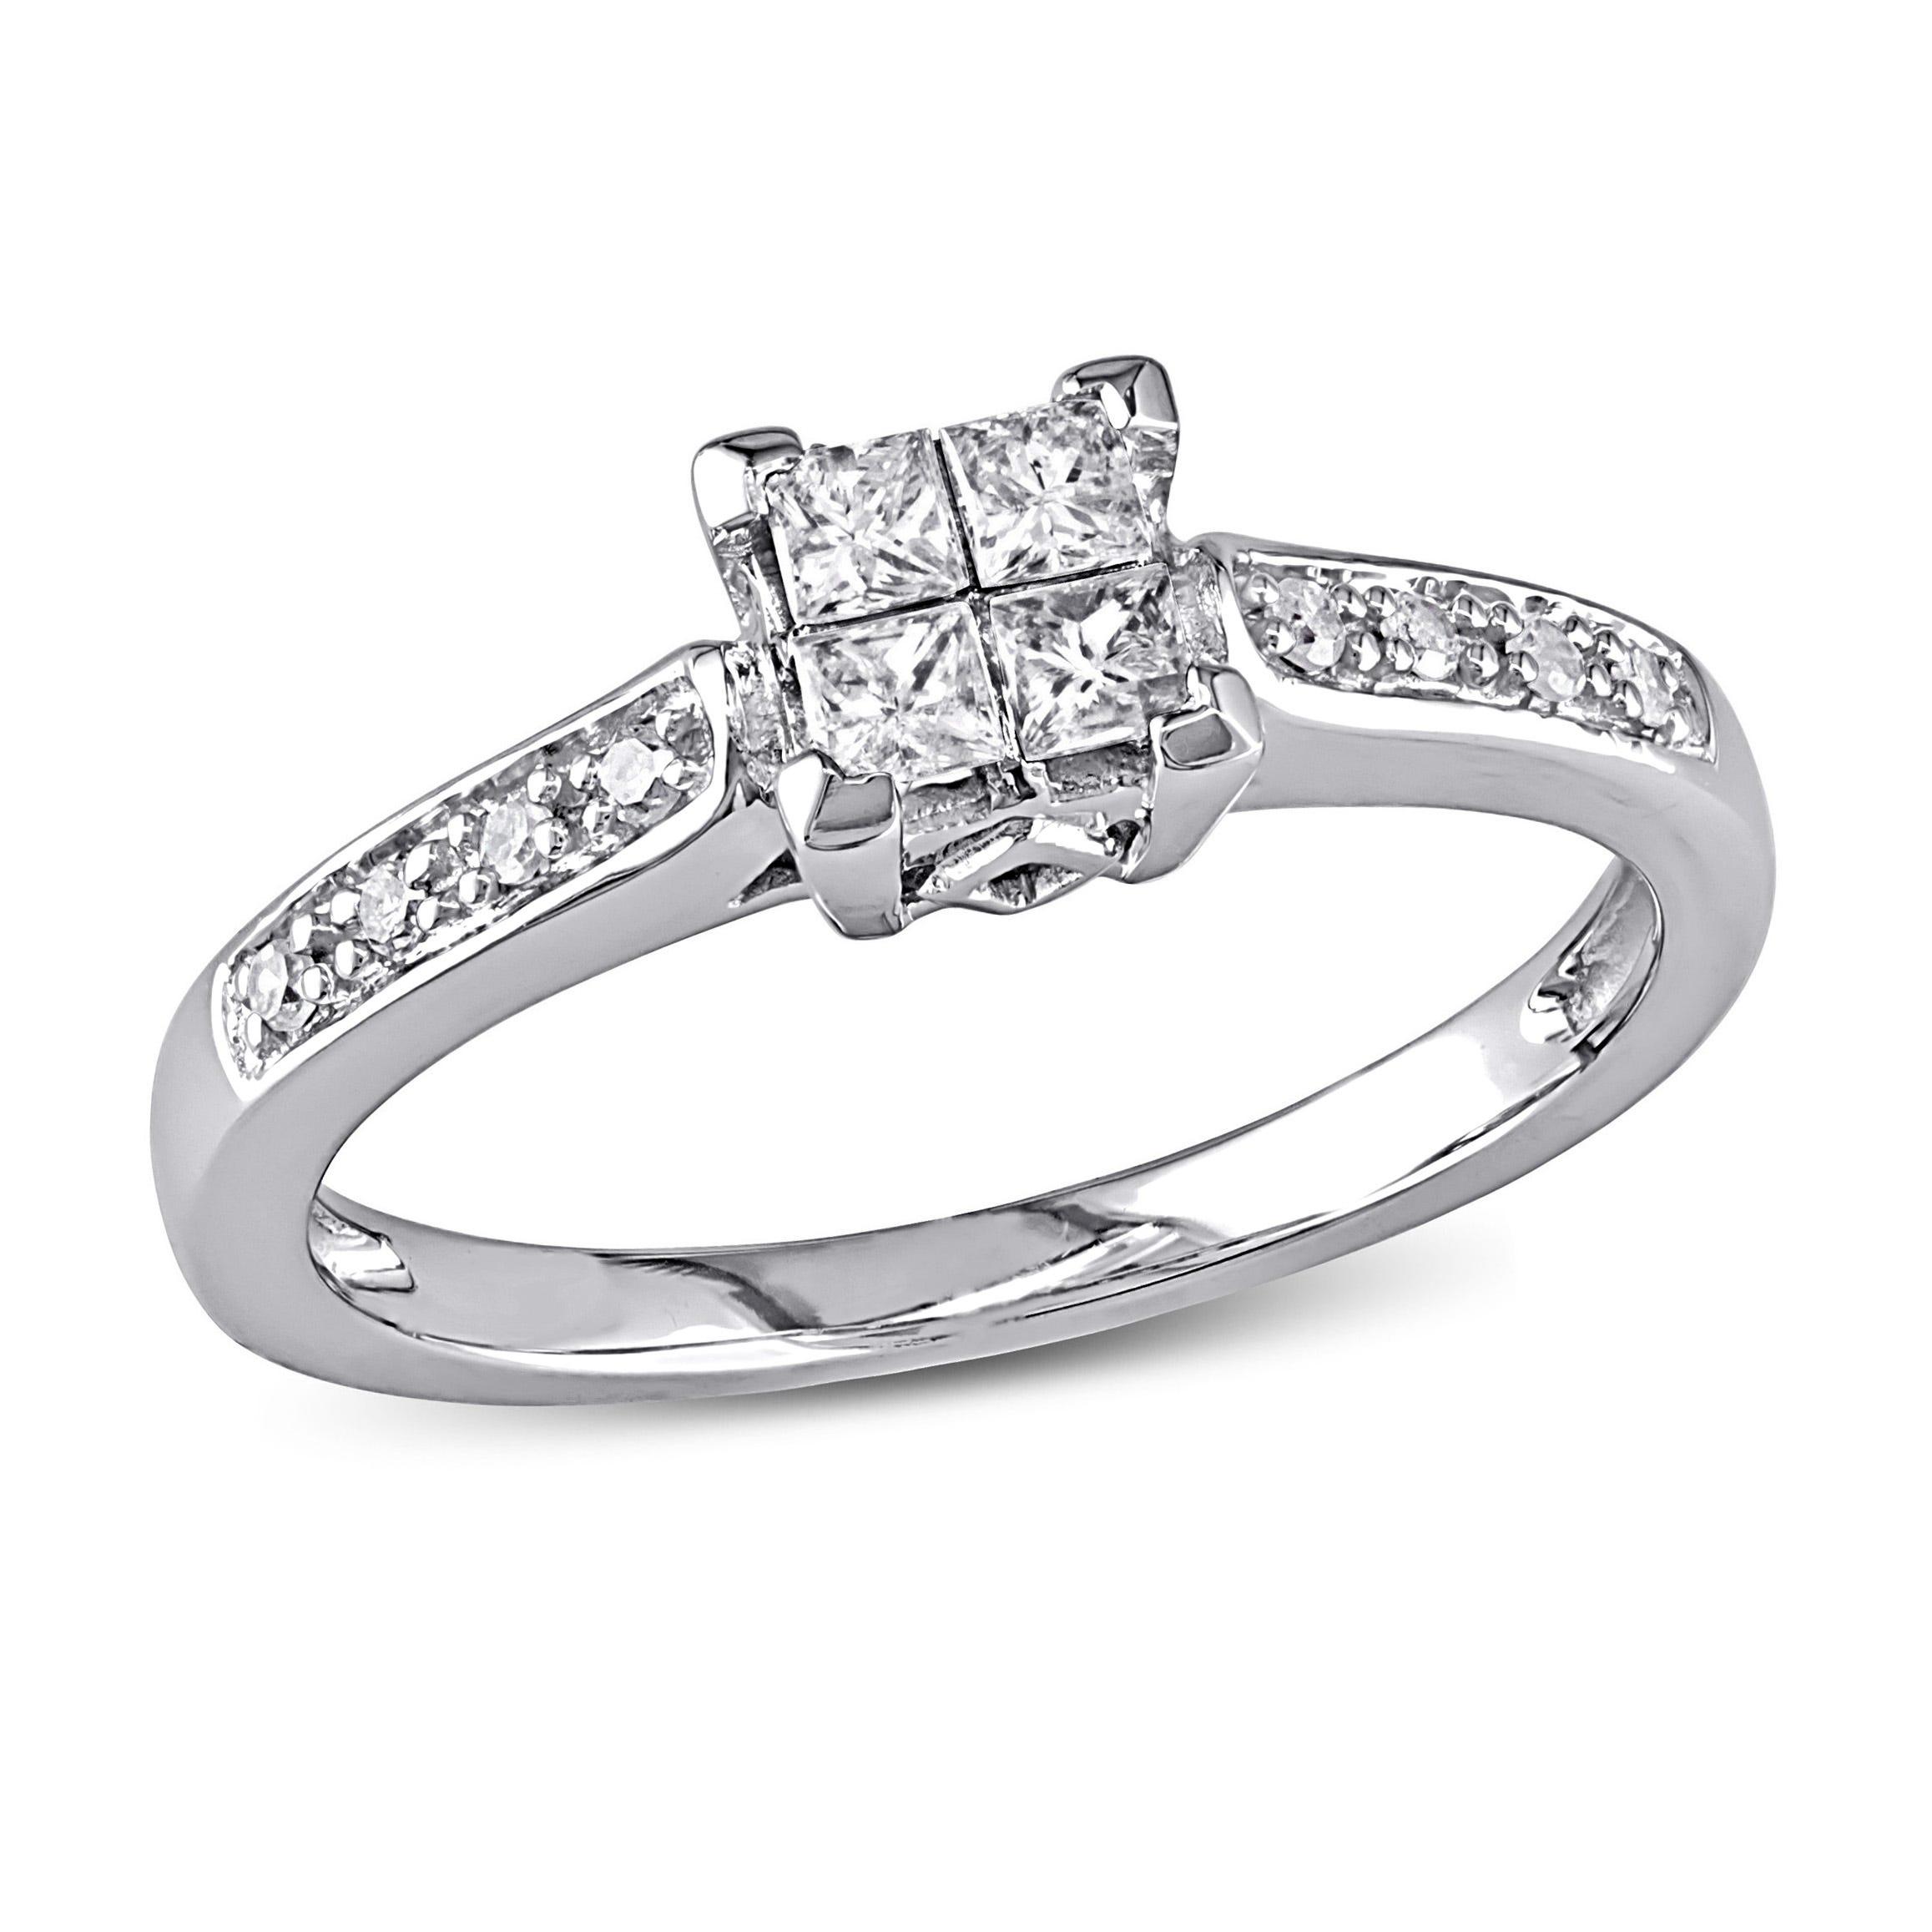 Princess & Round Cut White Diamond Promise Ring 1/4ctw. in 10k White Gold